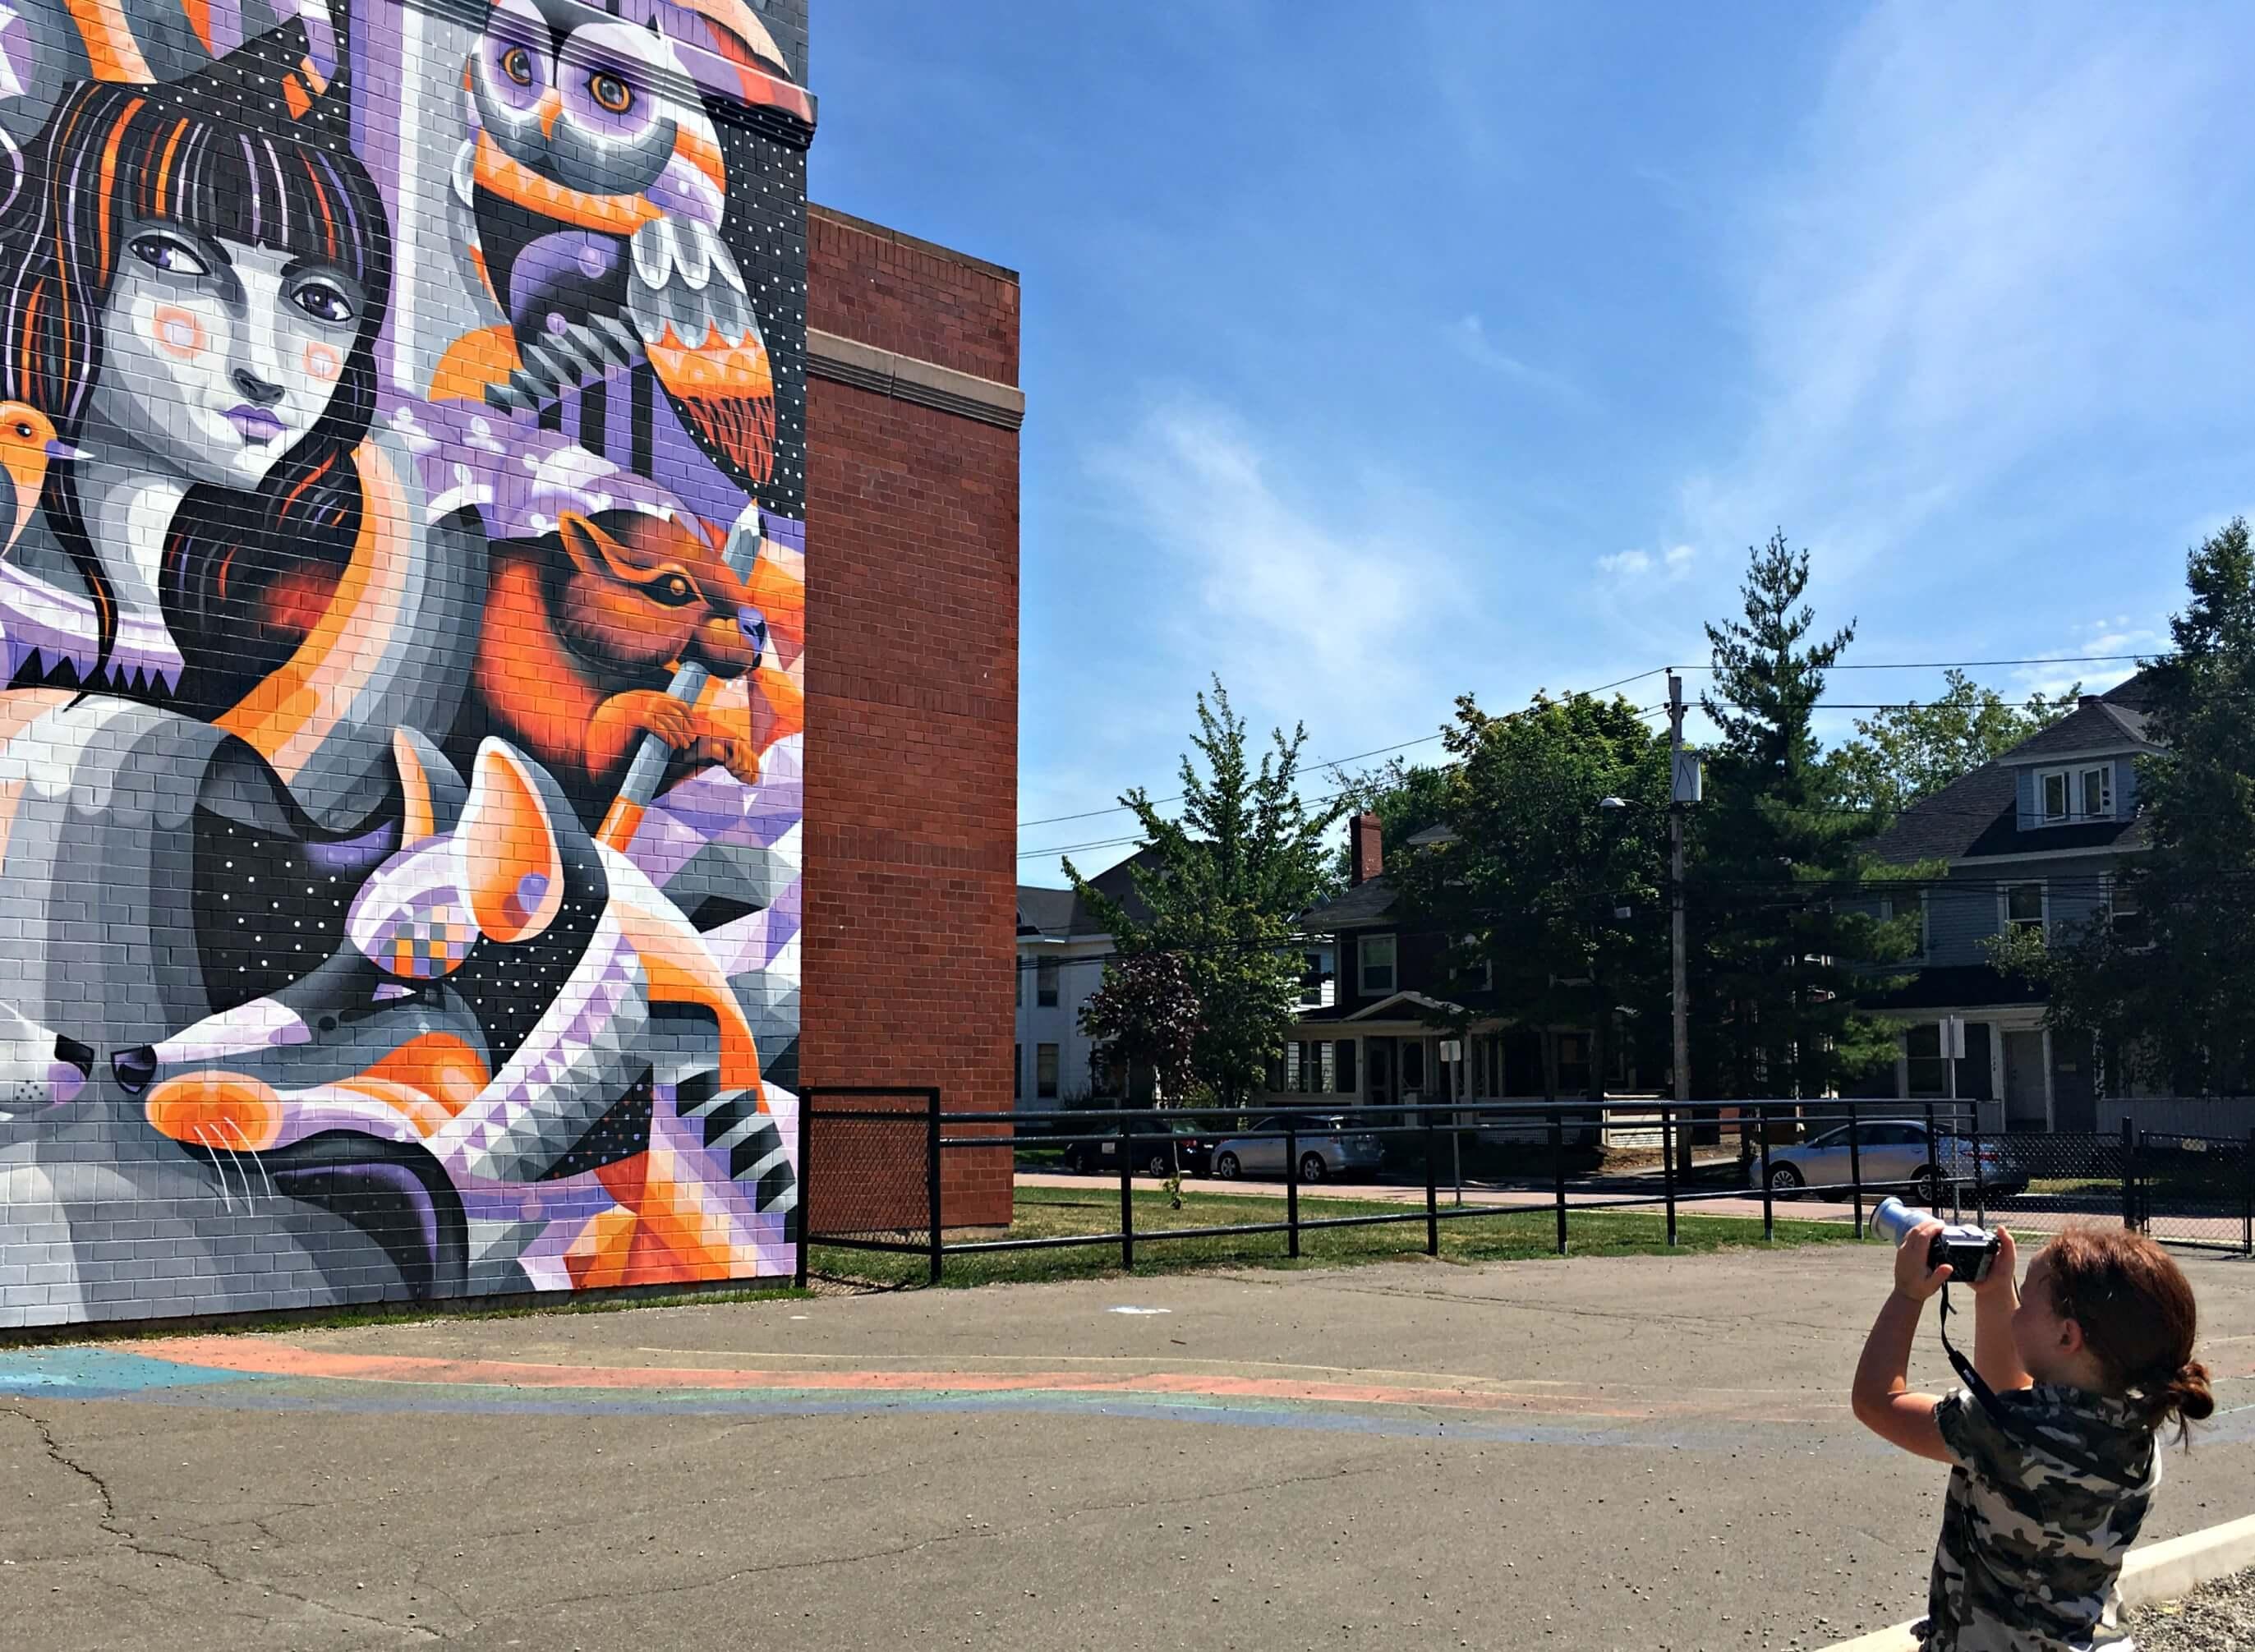 free things moncton kids family festival inspire murals public art photos pickle planet